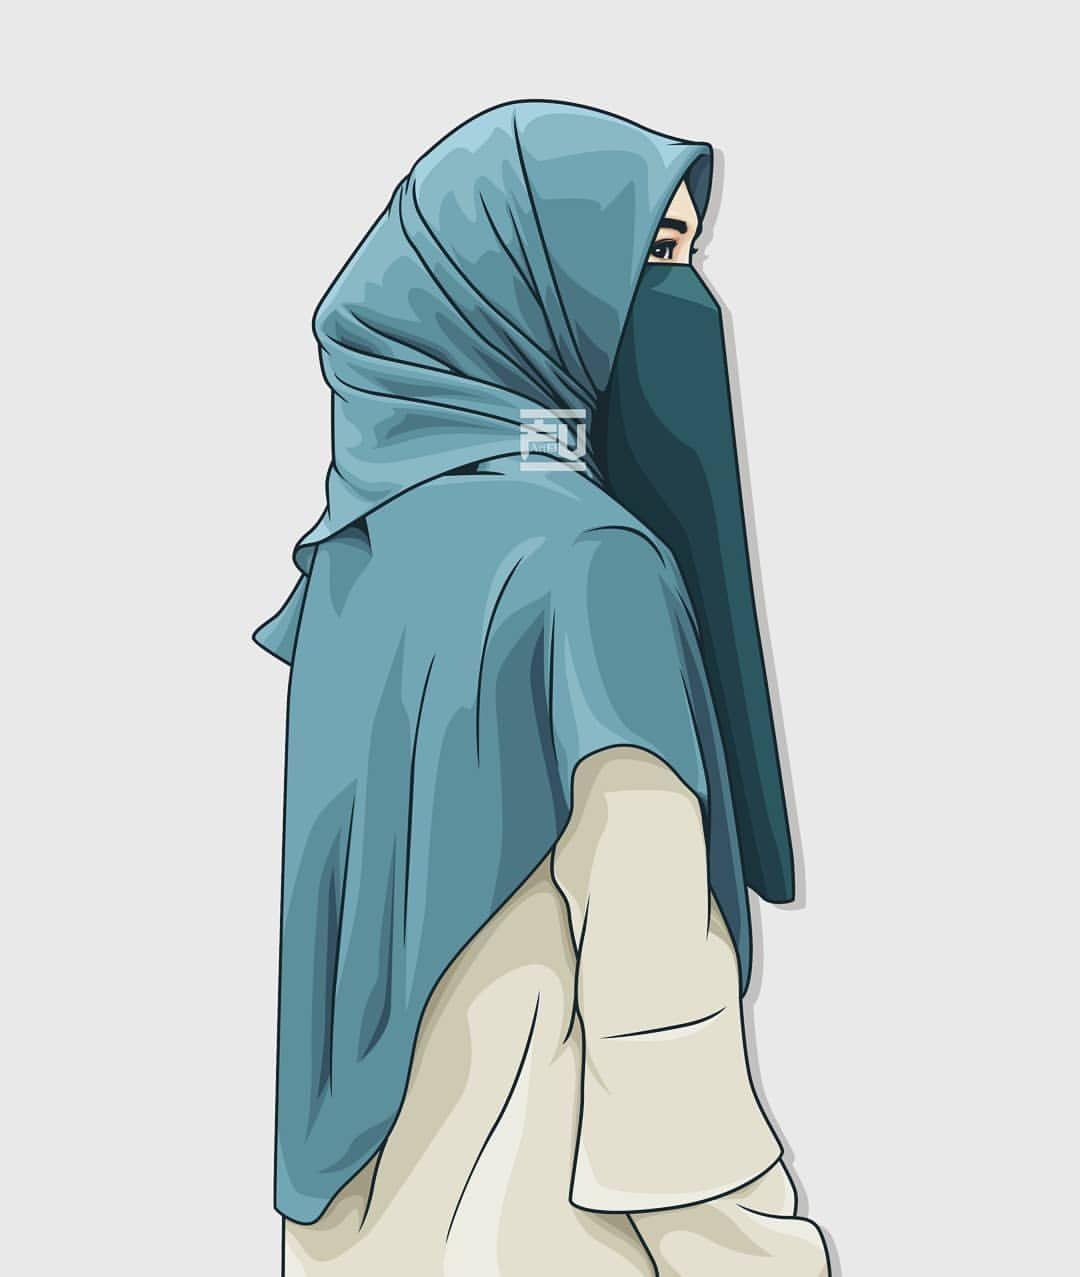 Turkey has condemned a charlie hebdo cartoon showing its president recep tayyip erdogan in underpants lifting up a woman's hijab. Wallpaper Muslimah Hijab Cartoon Niqab Girl 1080x1277 Download Hd Wallpaper Wallpapertip